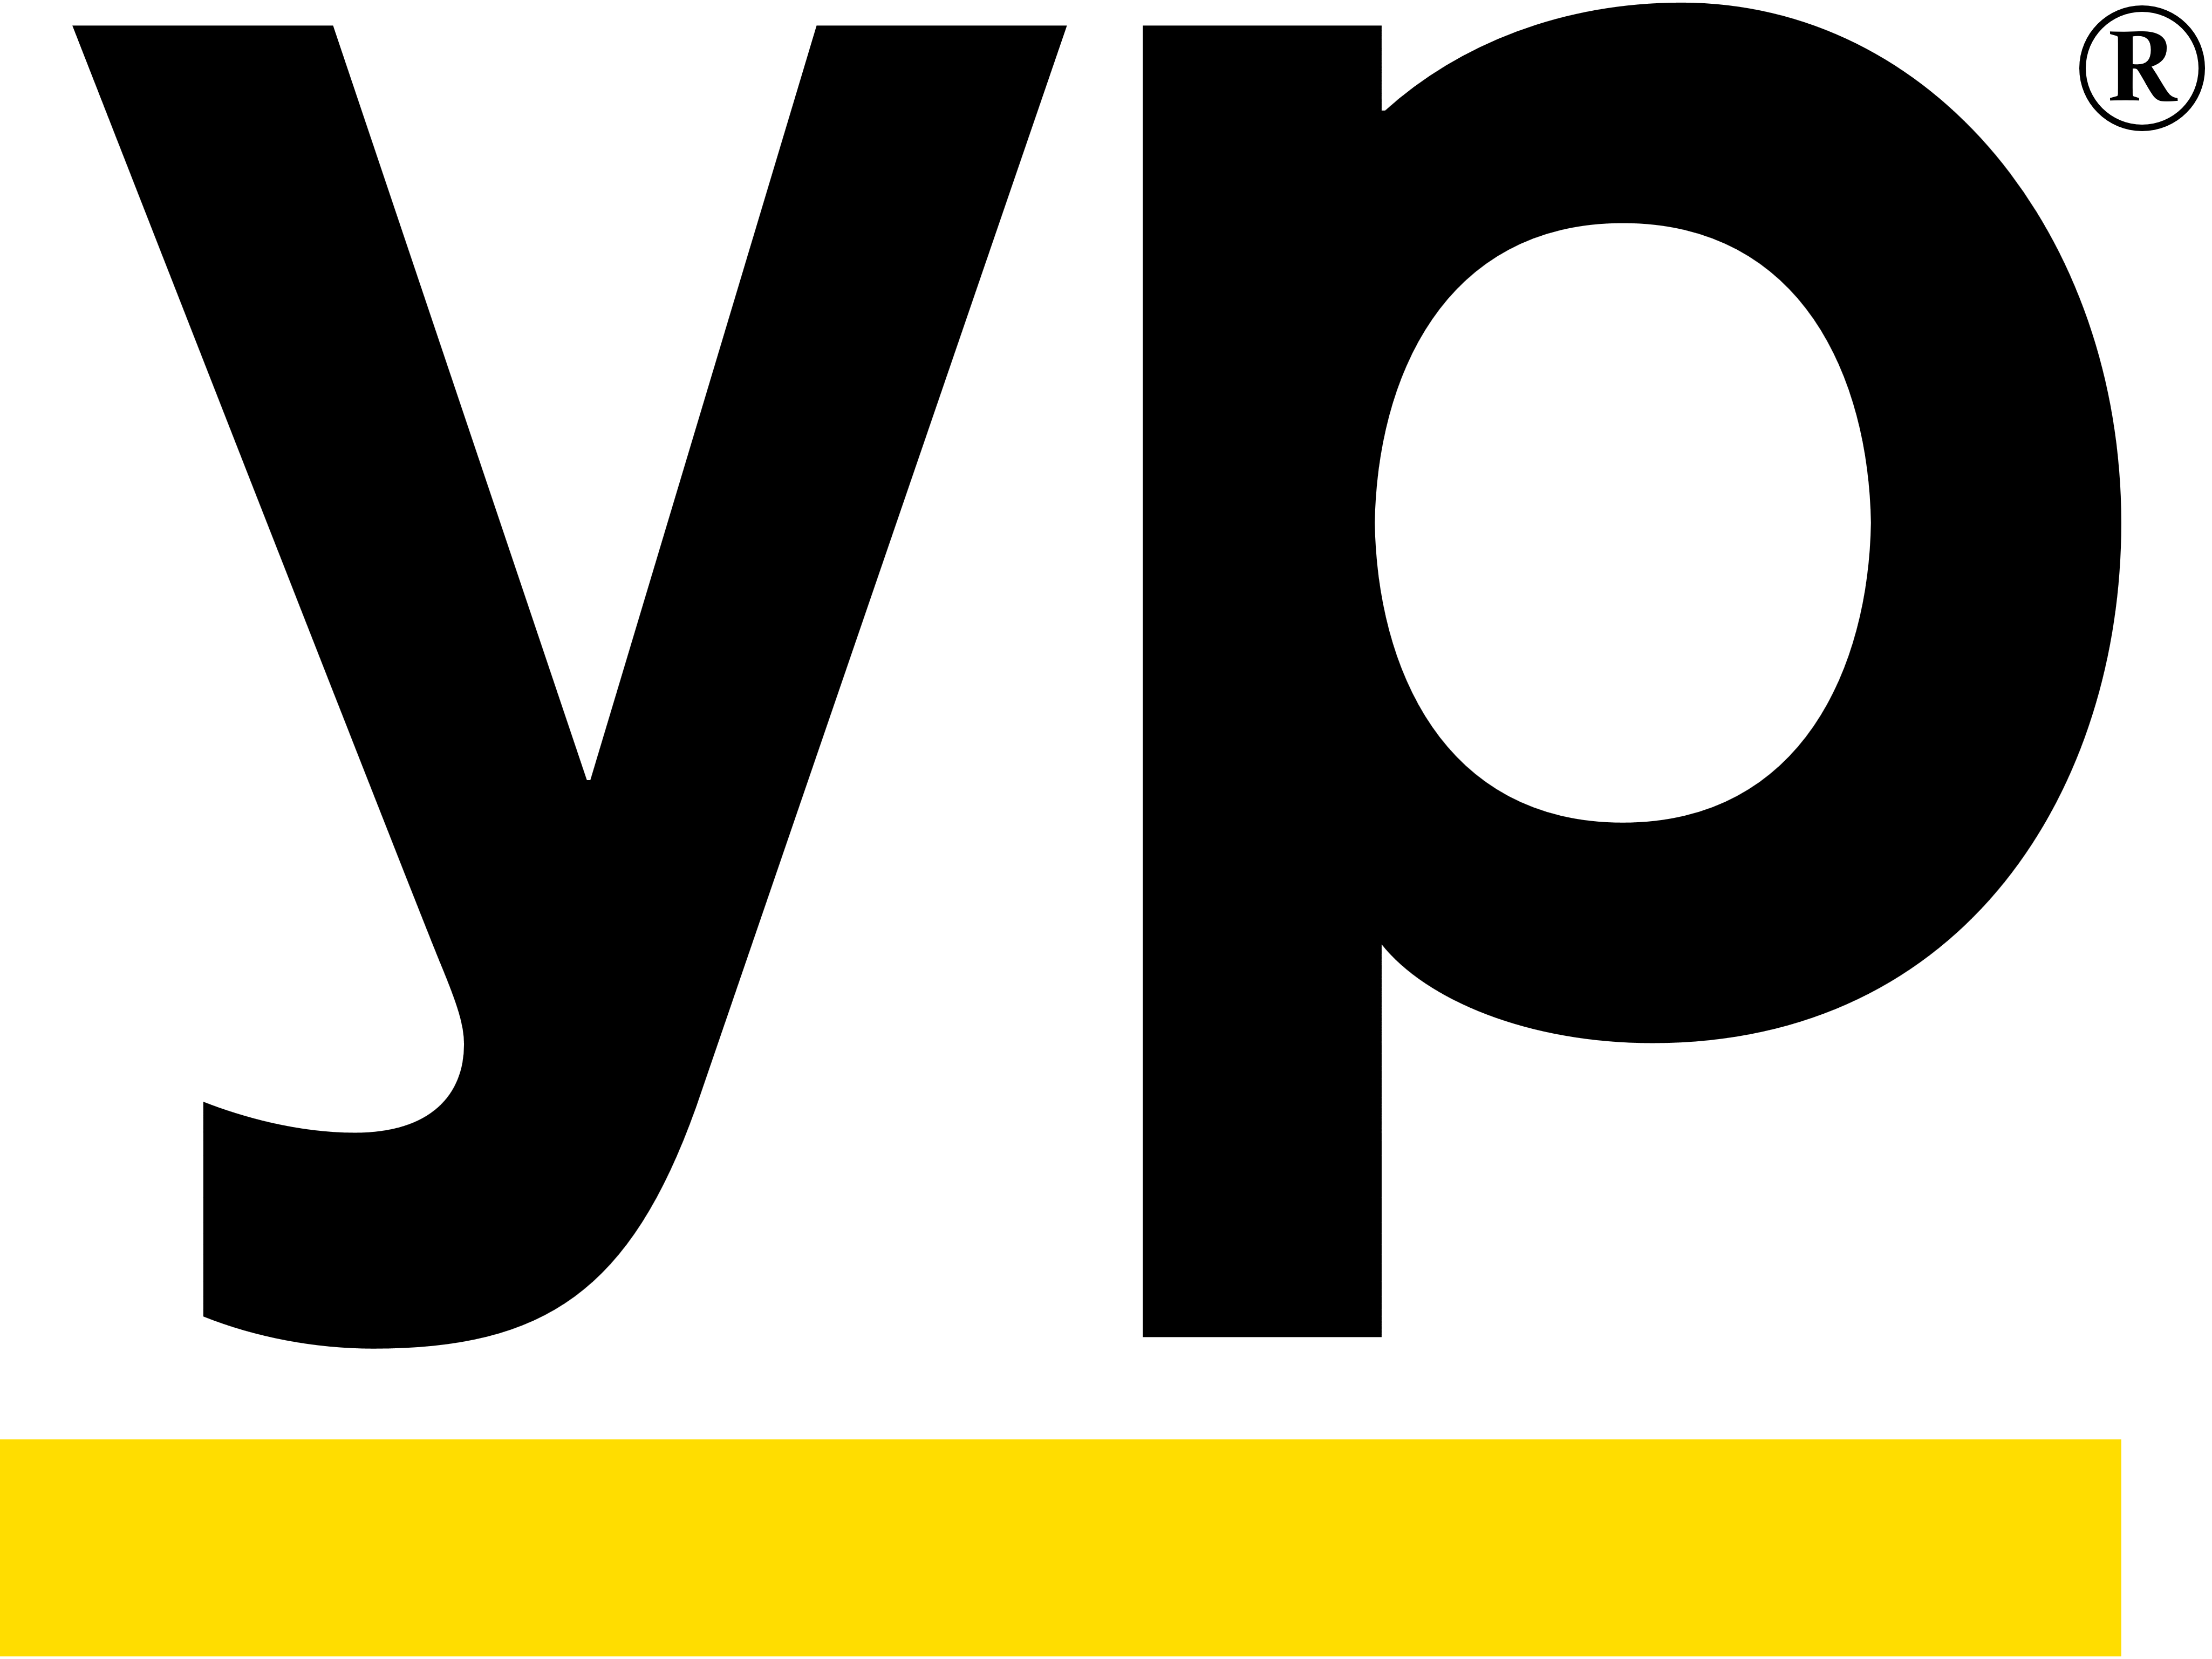 YP (yp.com) – Logos ...